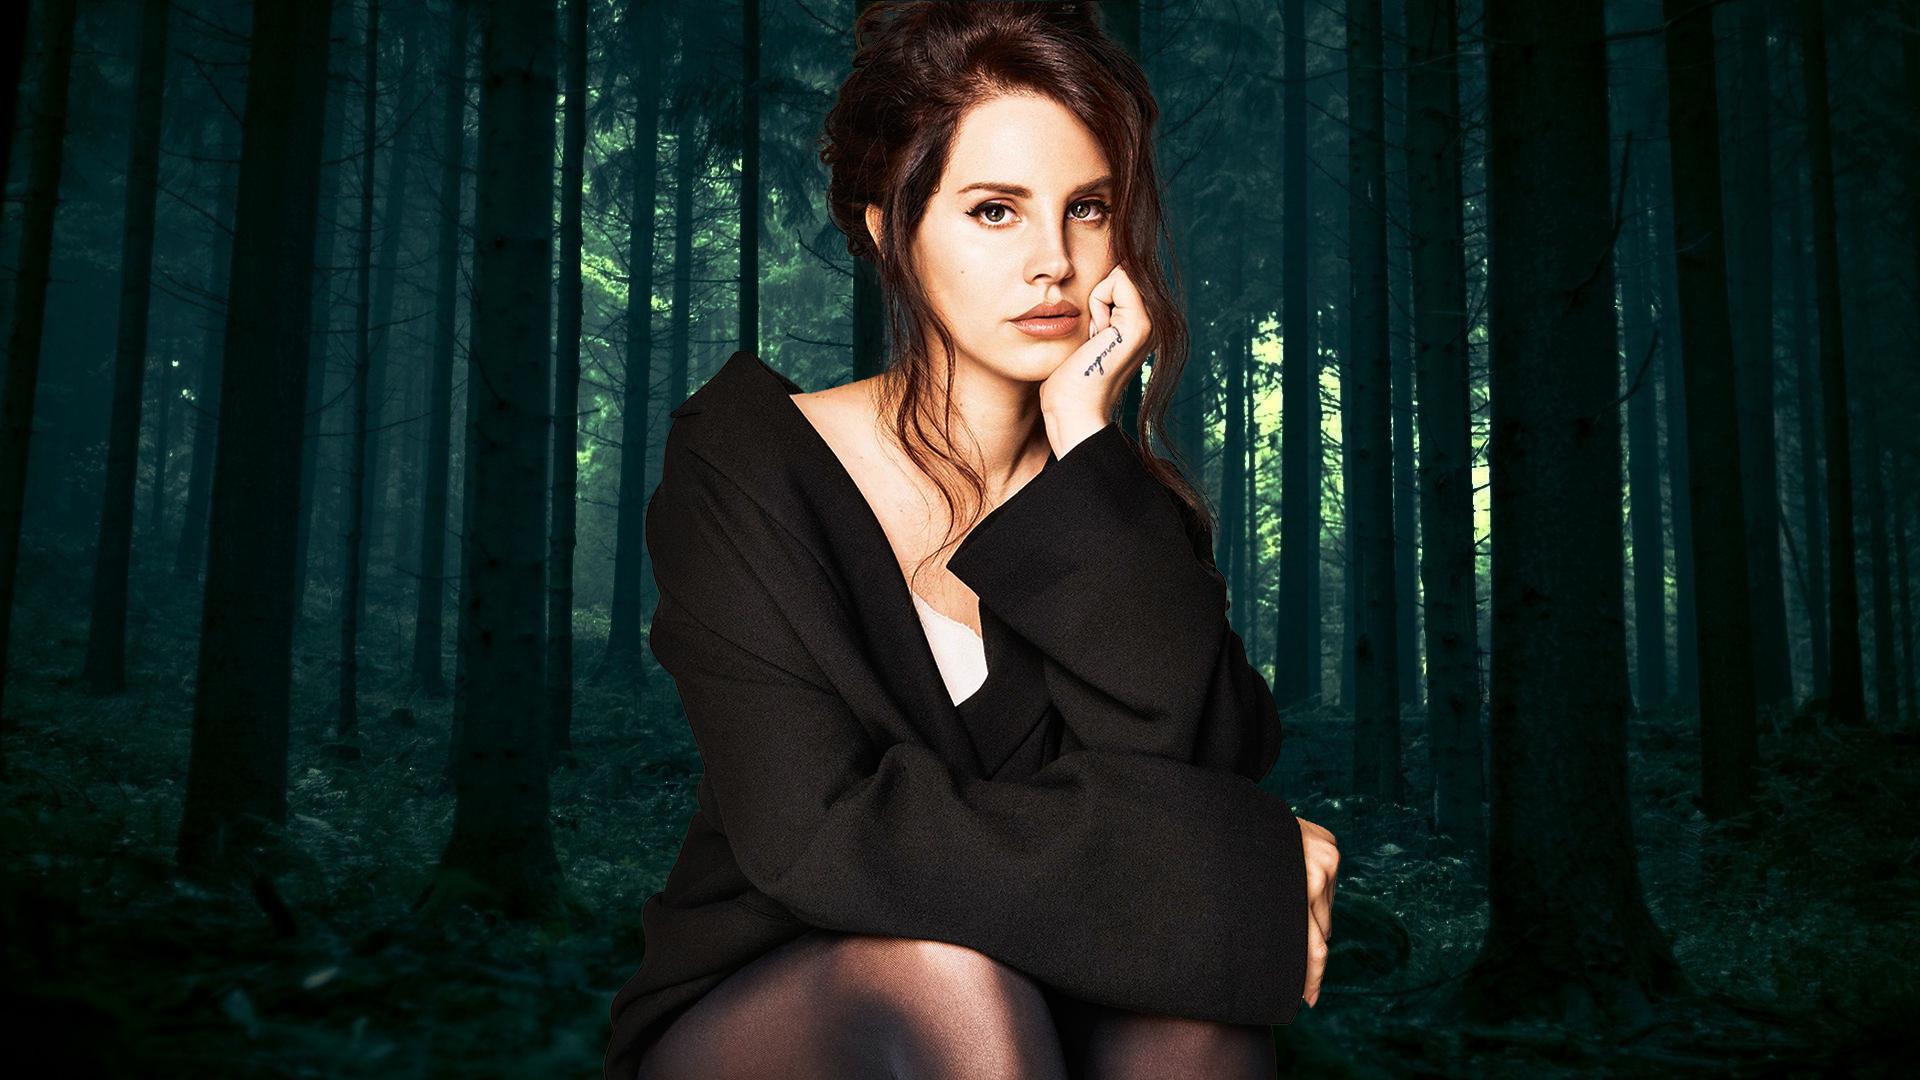 Free Download Lana Del Rey Wallpaper Hd By Maarcopngs 1920x1080